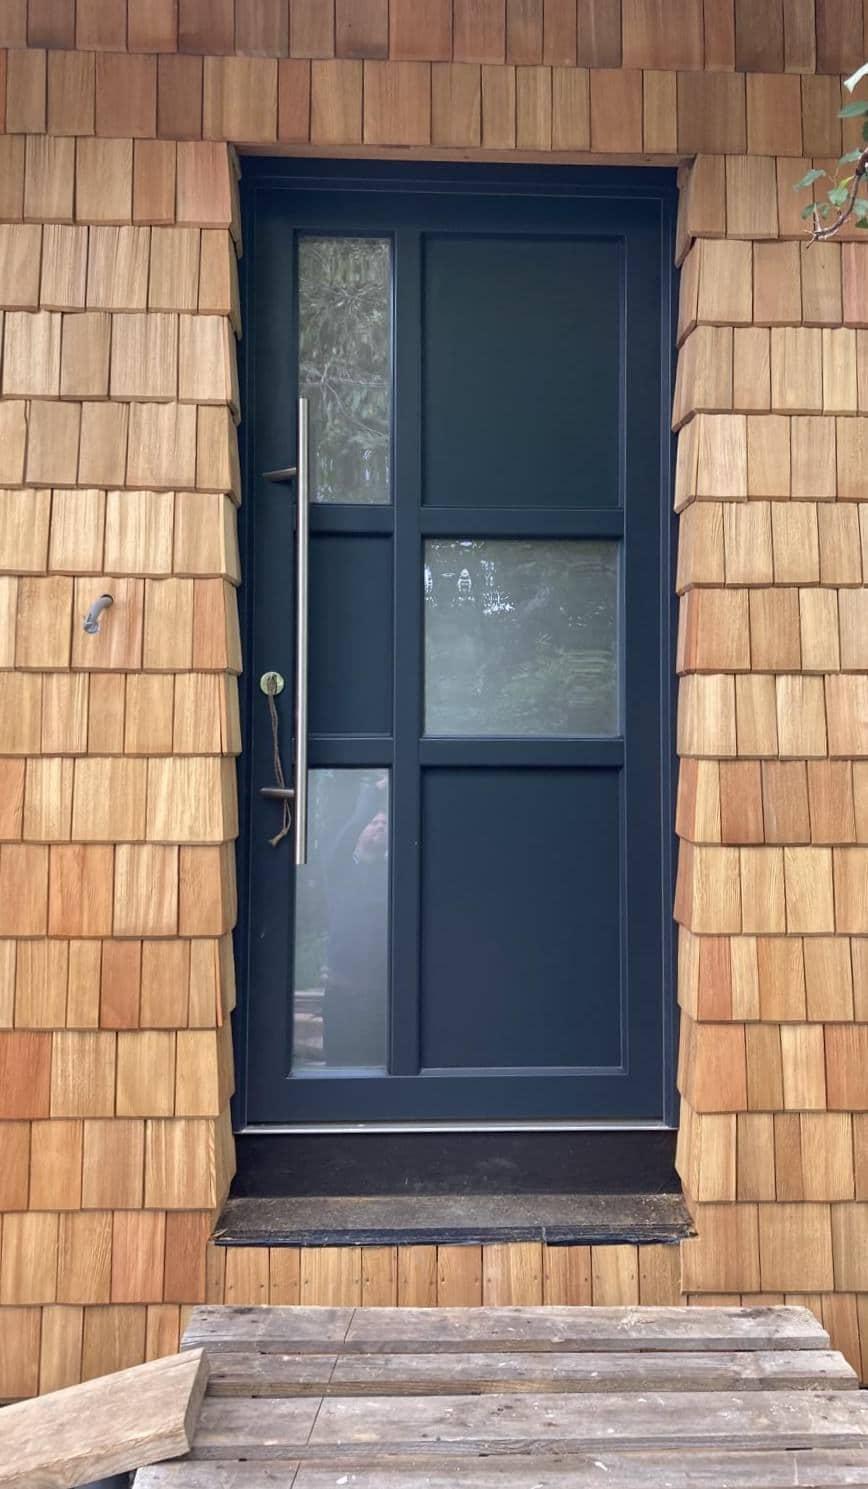 Thoma Holz100 Holz mit Lärchernfassade Türe